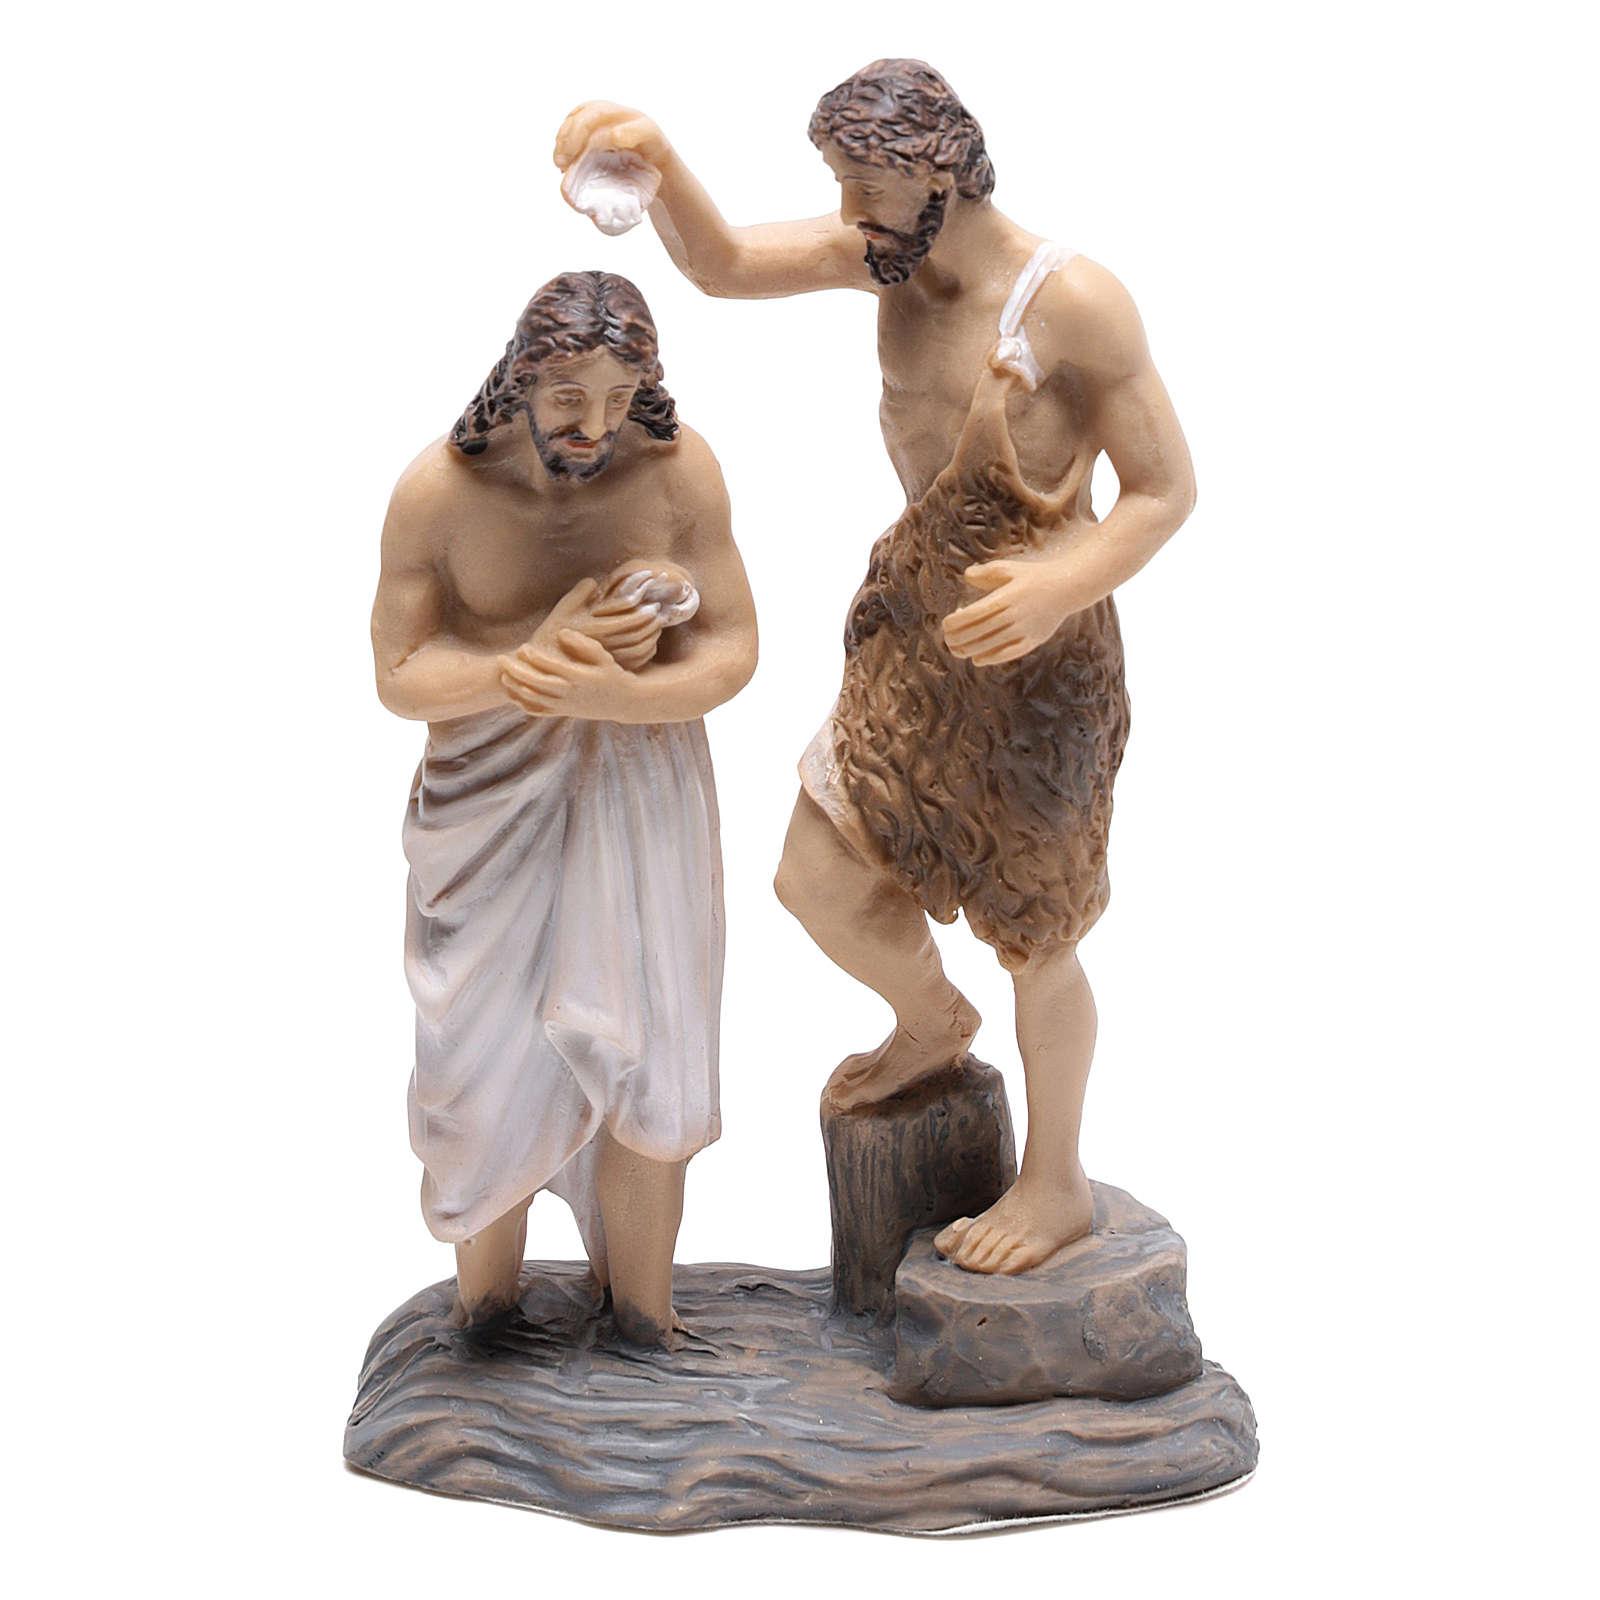 Passionsszene, Taufe Jesu mit Johannes dem Täufer, 9 cm Krippe 4